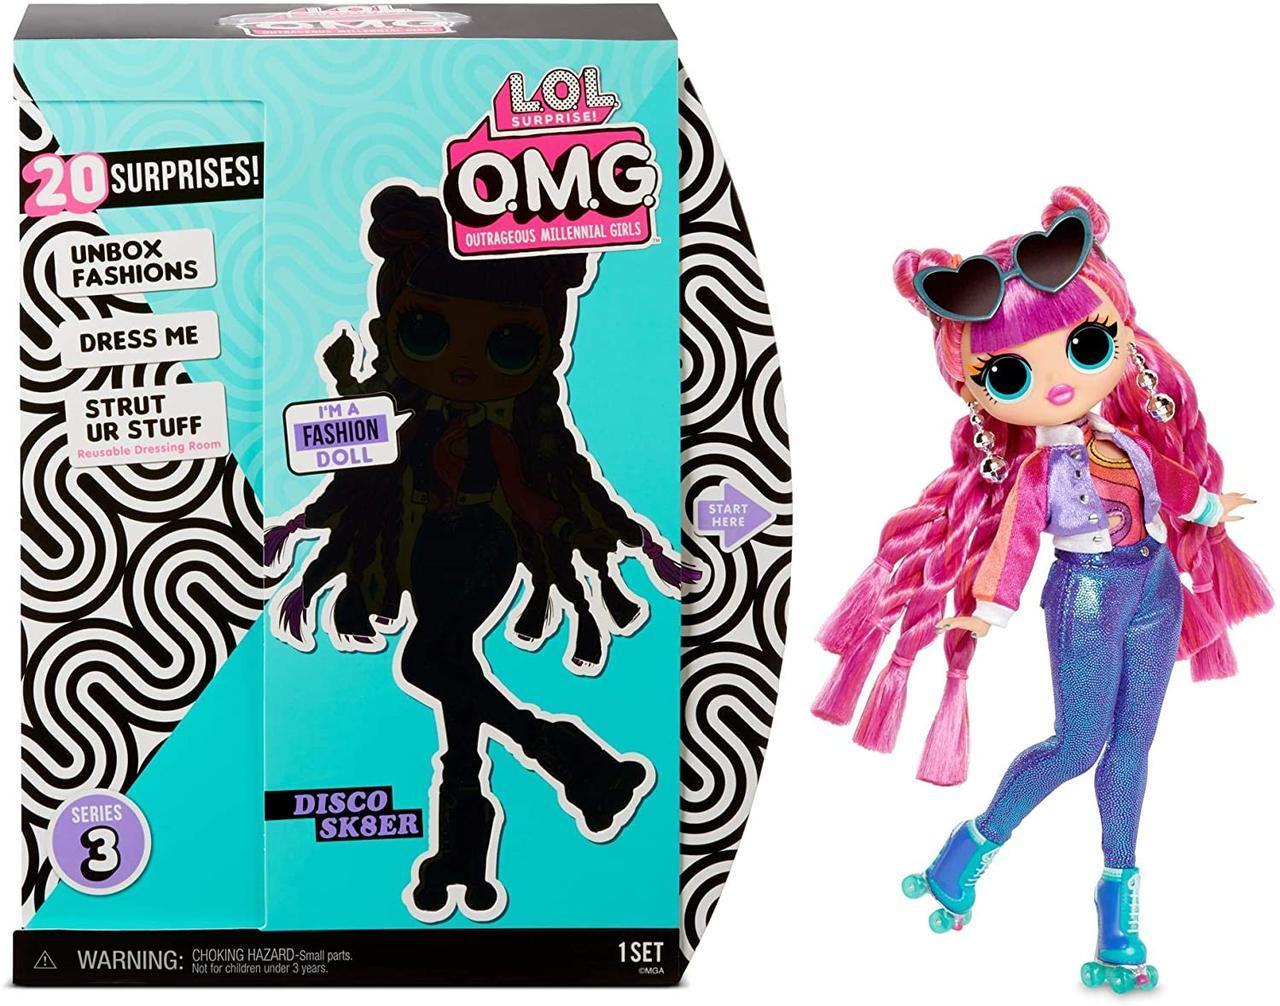 Лялька ЛОЛ ОМГ Диско Скейтер 3 серія Ролер Чик L. O. L. Surprise! O. M. G. 3 Roller Chick Fashion 20 Surprises